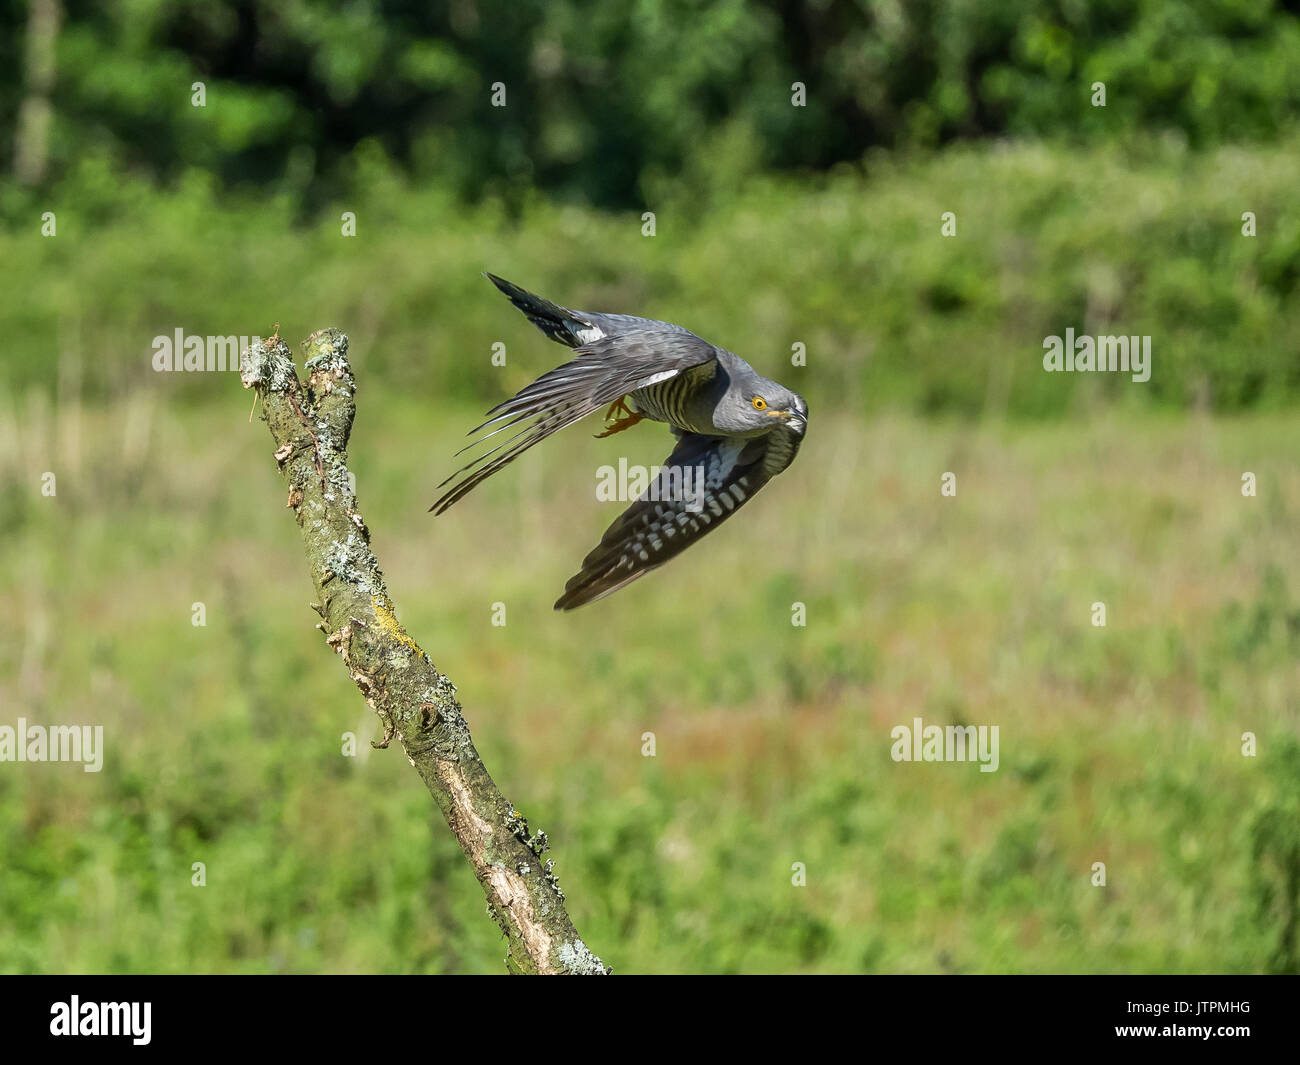 Cuckoo (Cuculus canorus) in flight at Thursley common, Surrey, England, UK - Stock Image